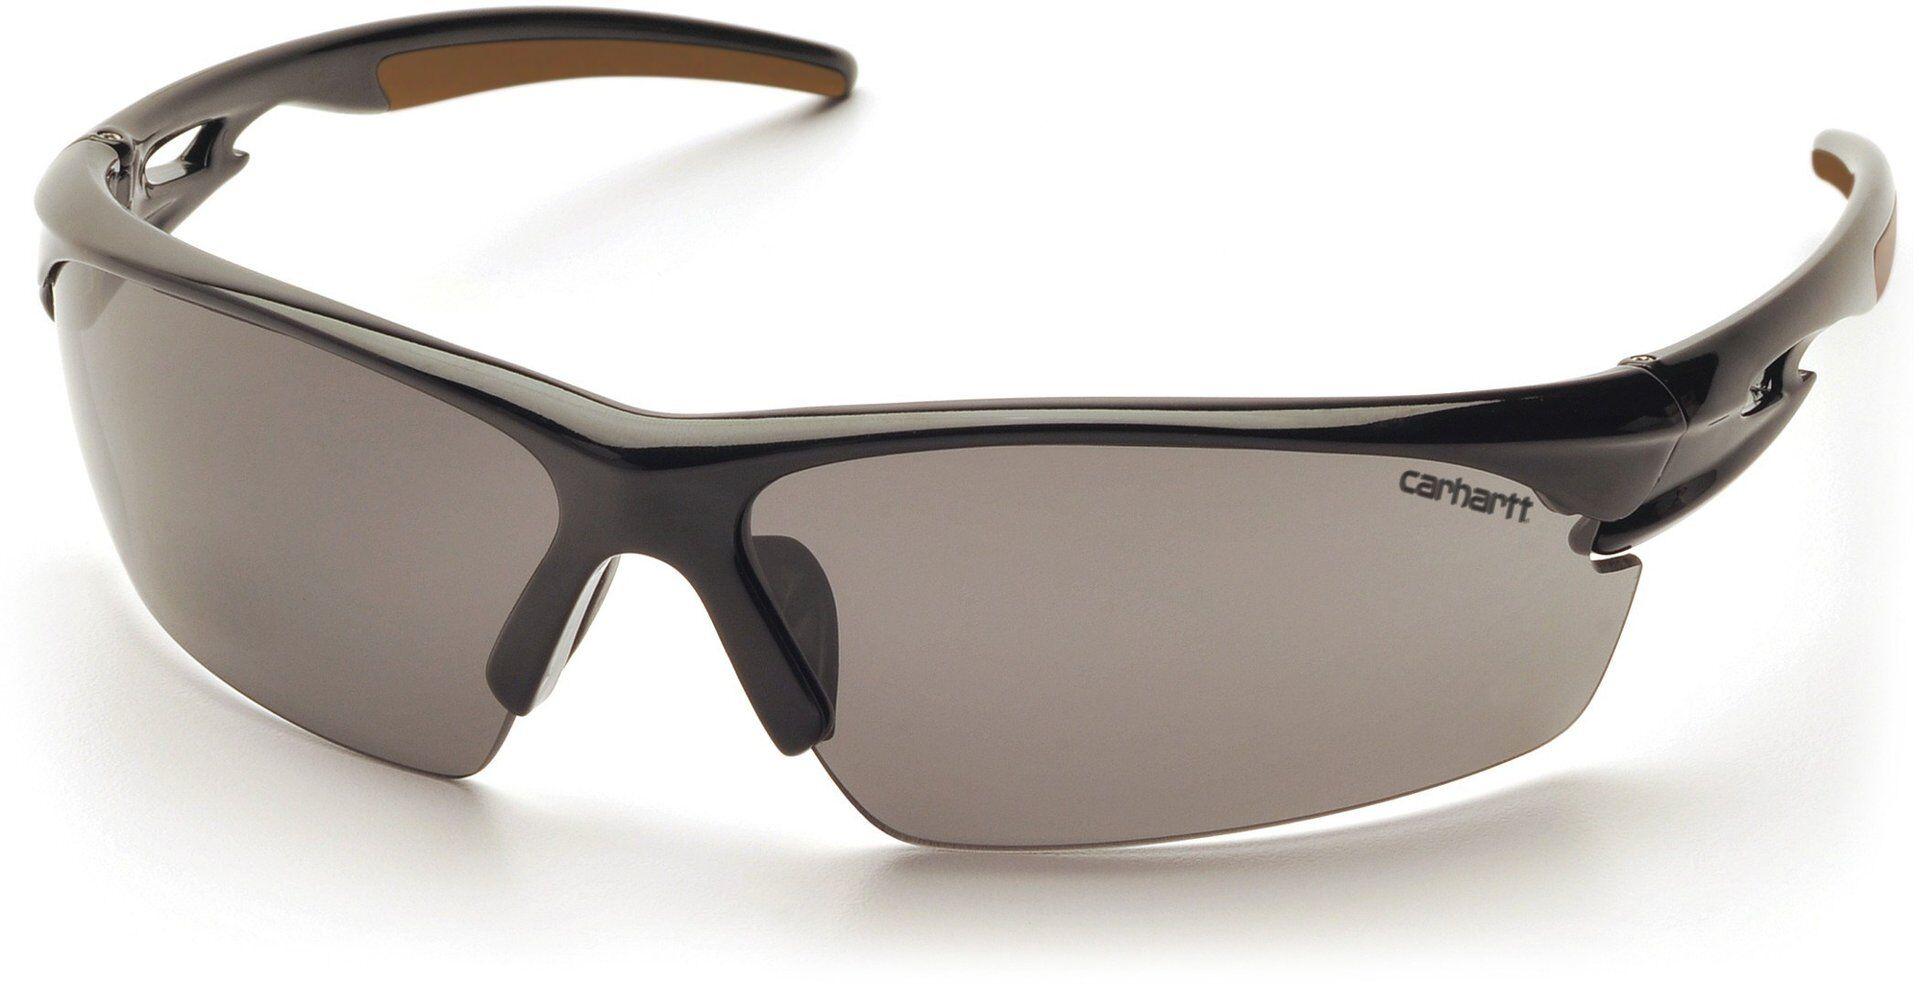 Carhartt Ironside Plus Safety Glasses Grey